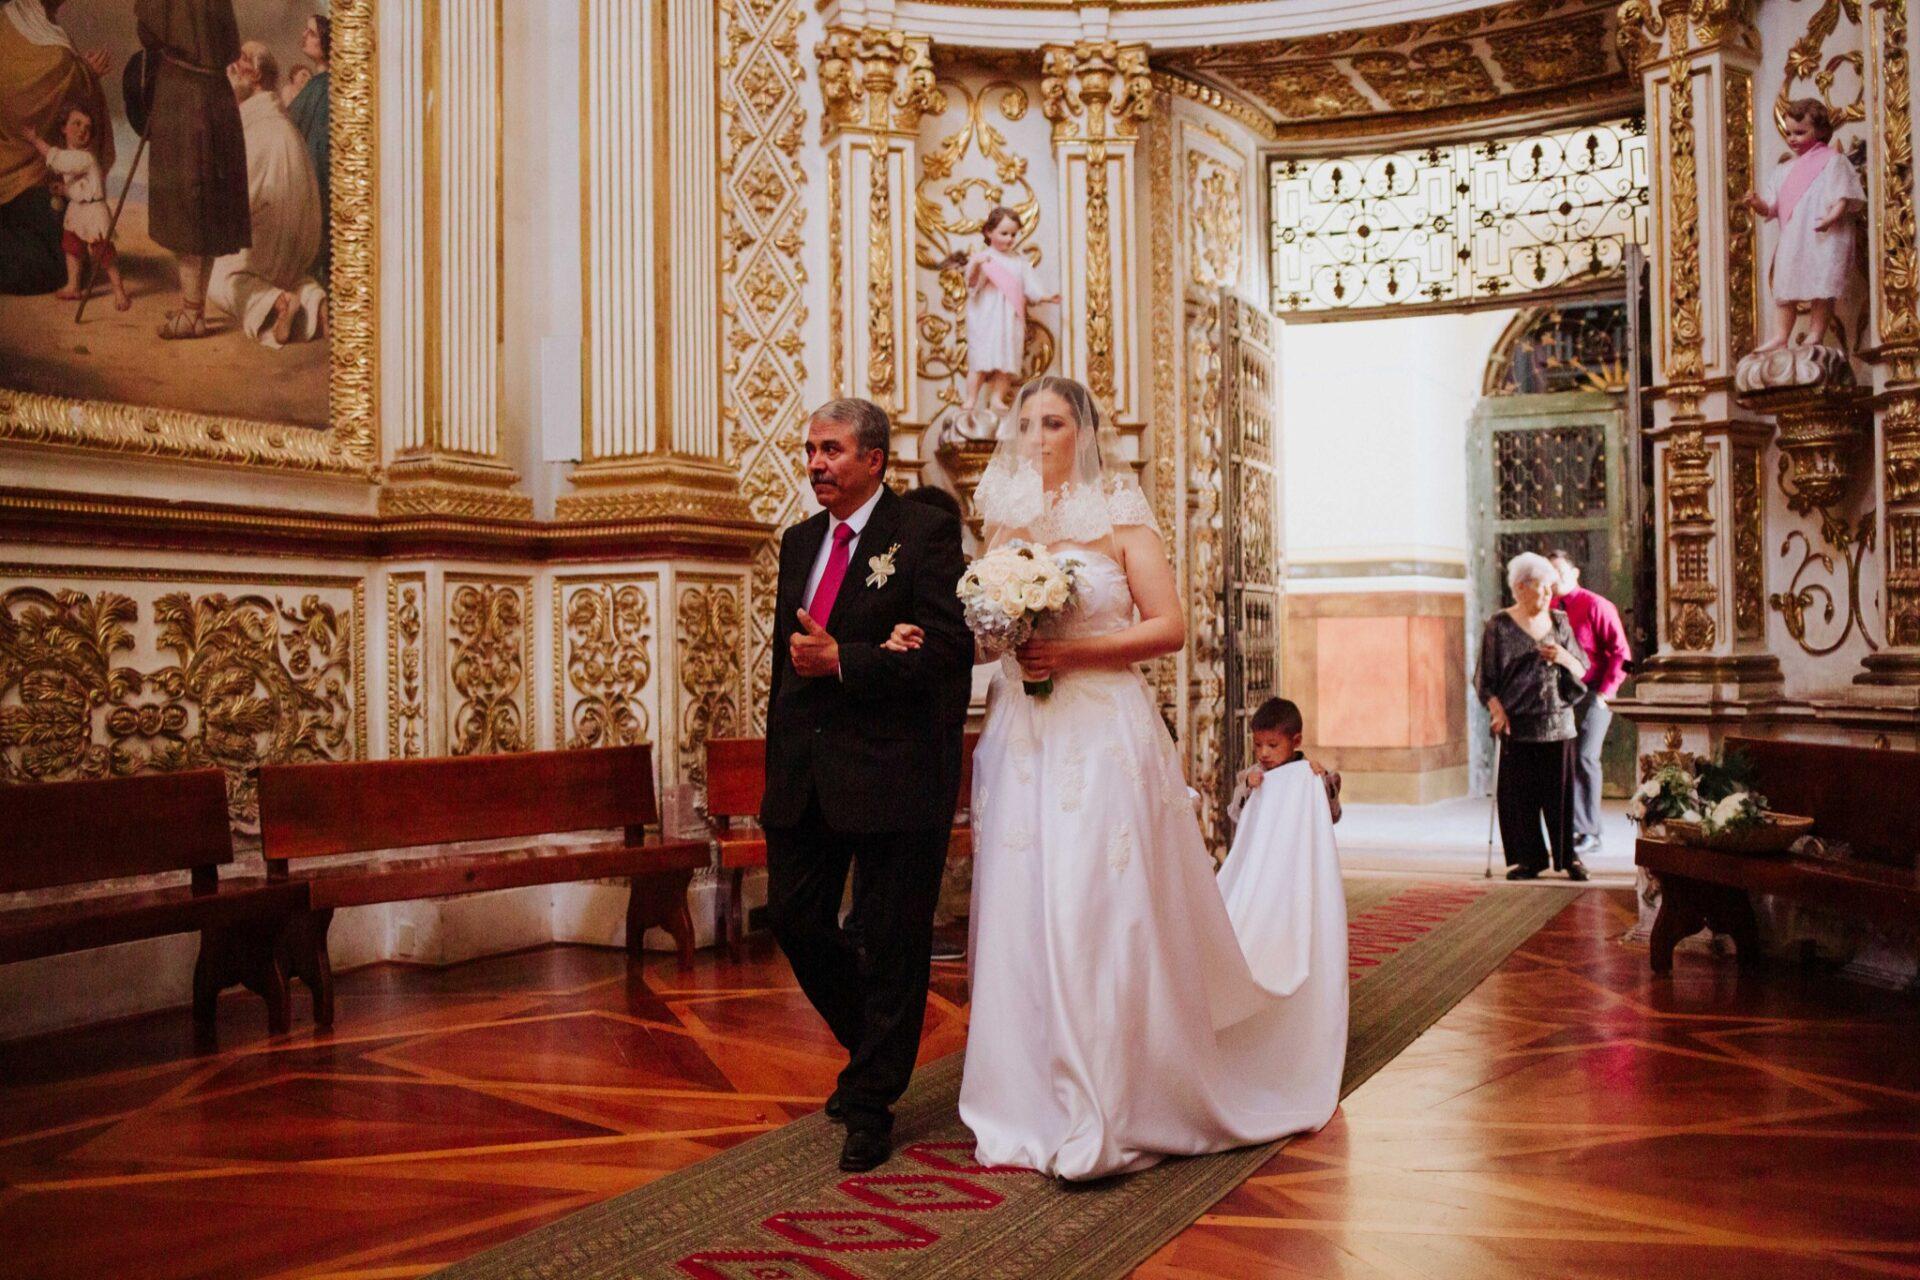 javier_noriega_fotografo_bodas_centro_platero_zacatecas_wedding_photographer5